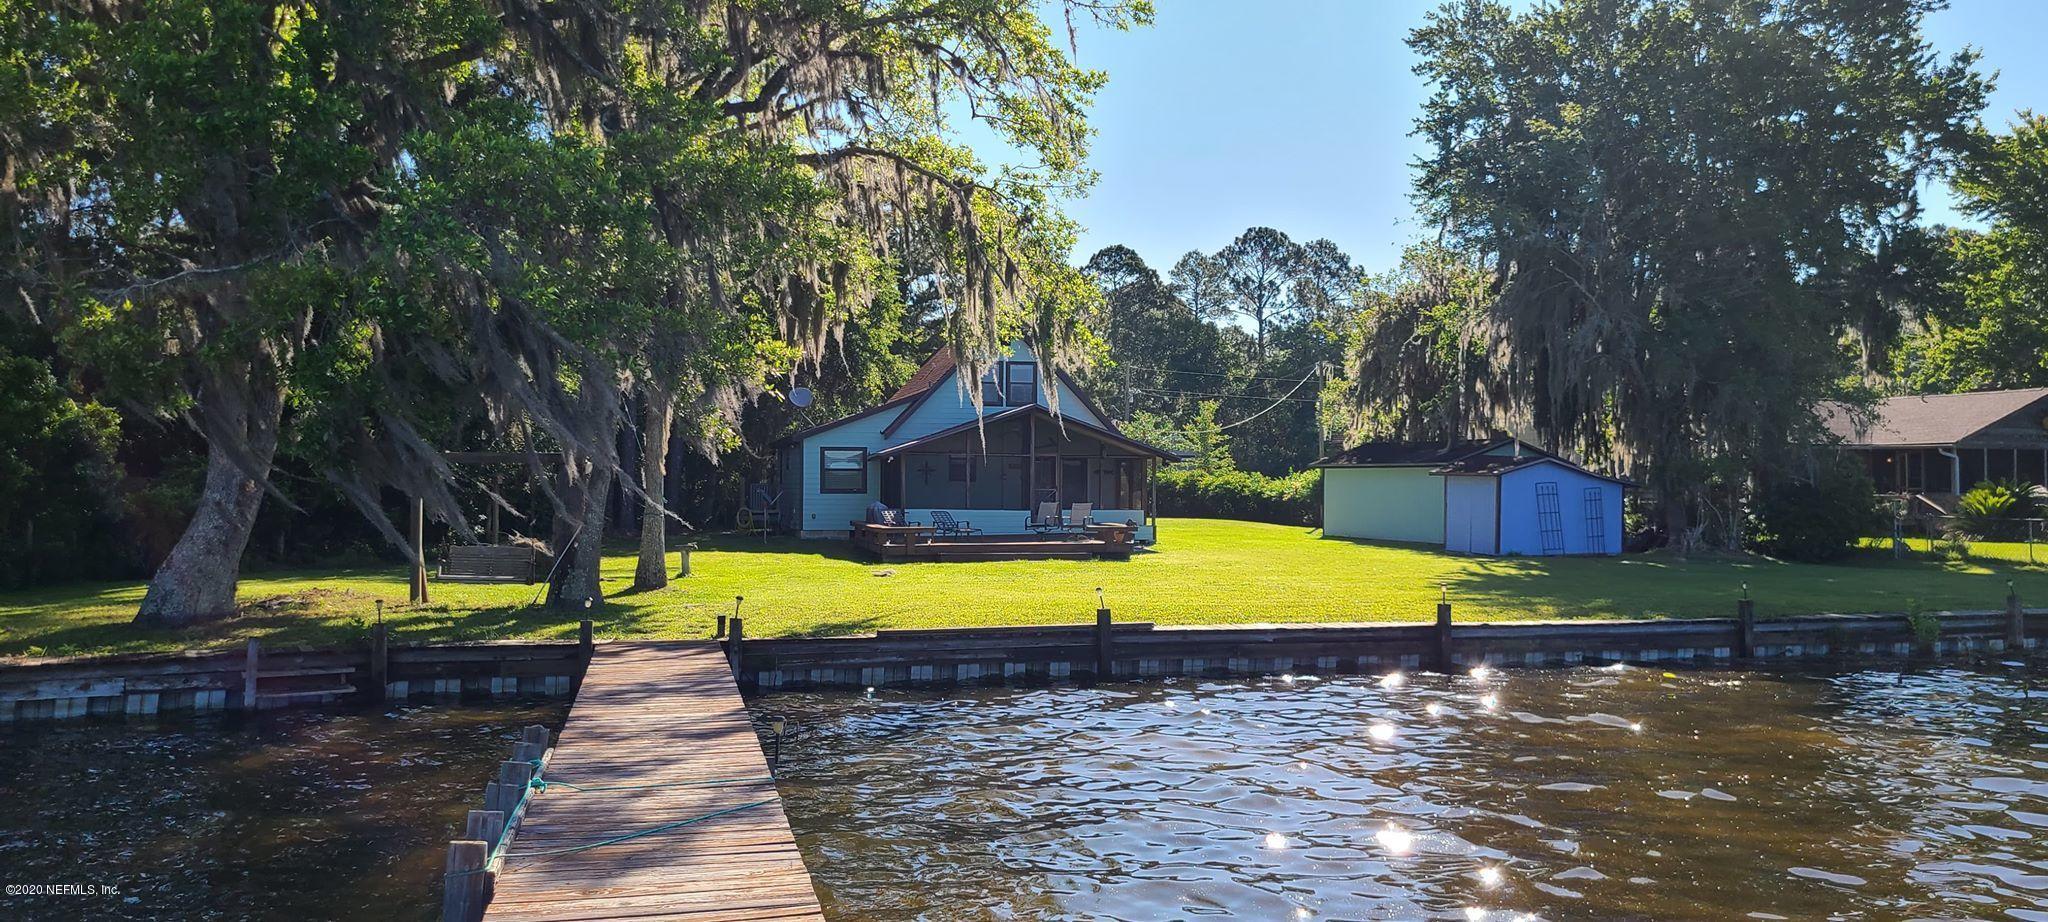 115 FLORA, FLORAHOME, FLORIDA 32140, 2 Bedrooms Bedrooms, ,1 BathroomBathrooms,Residential,For sale,FLORA,1051310